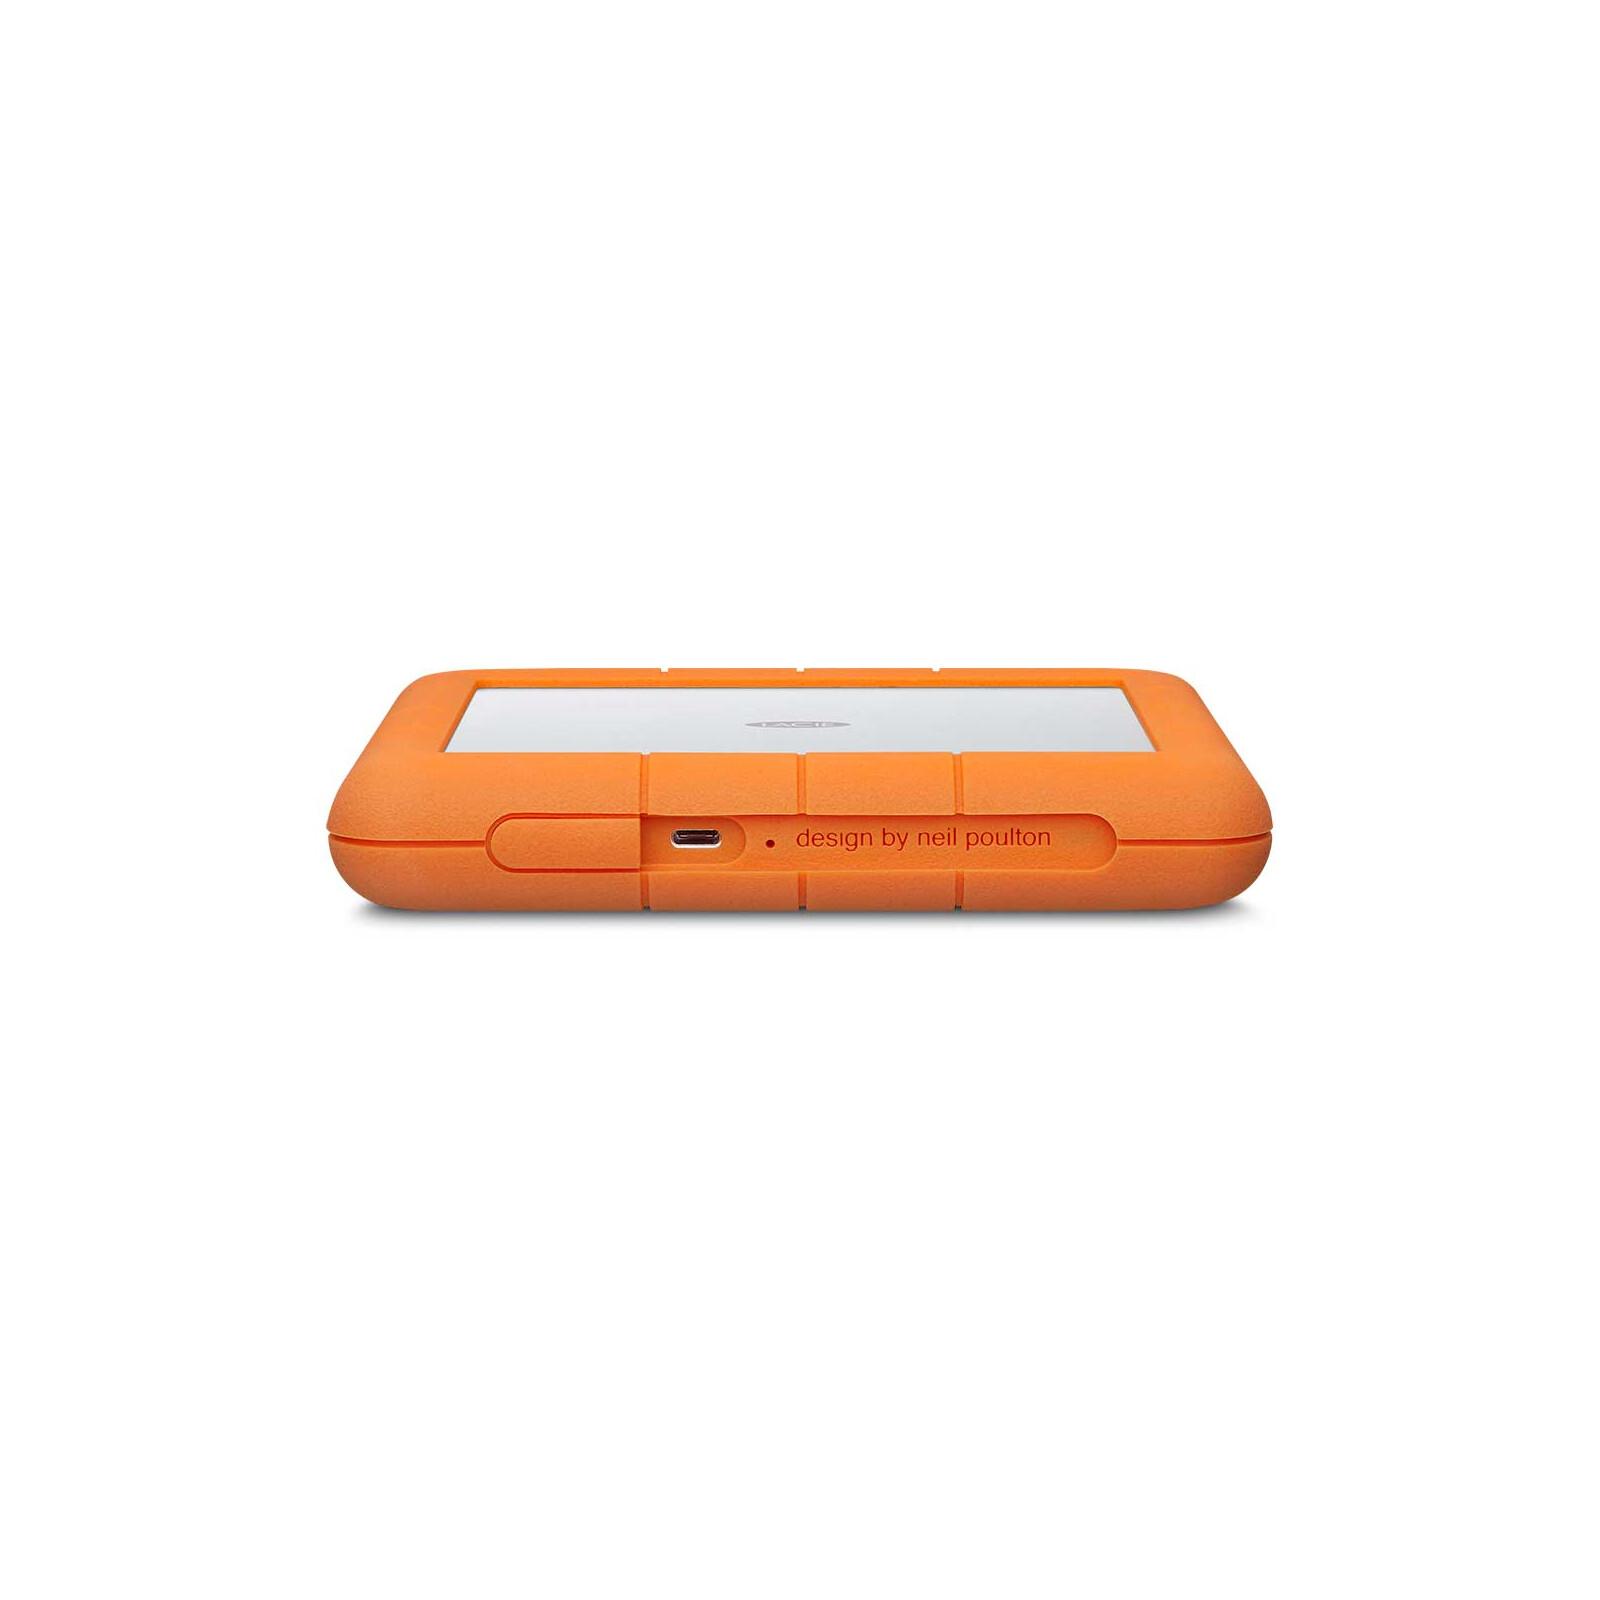 LaCie Rugged Raid Shuttle 8TB USB-C, 2HDDs, Raid 0/1